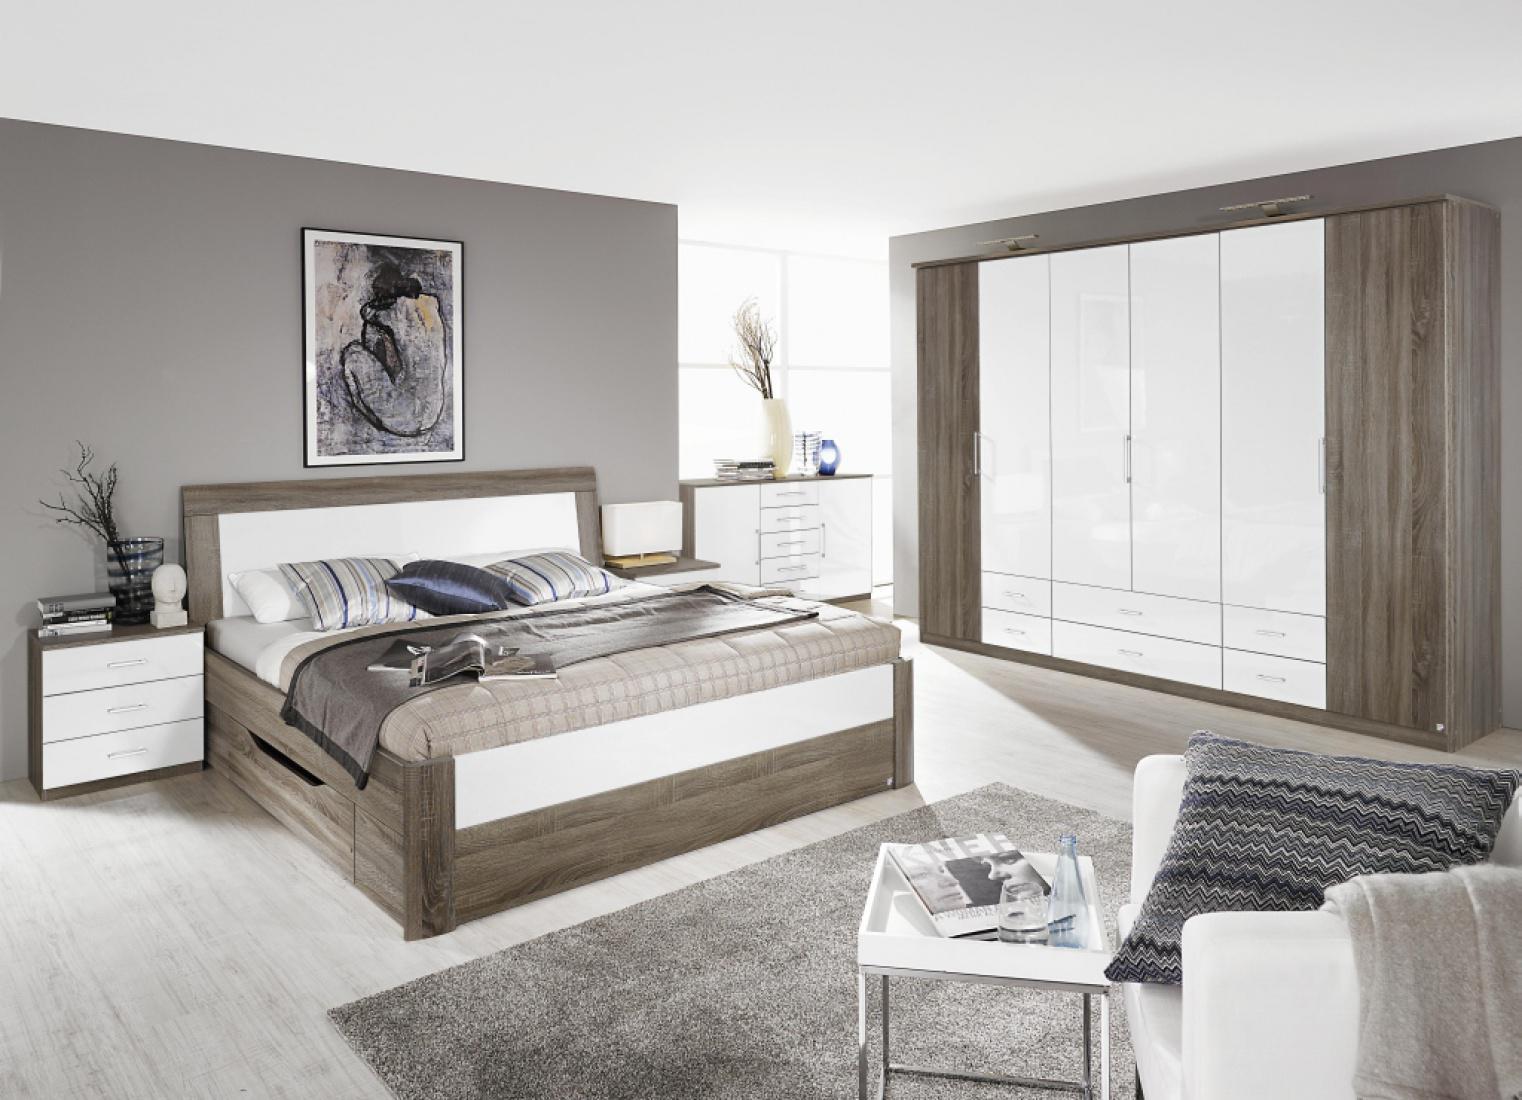 komplett schlafzimmer arona 4 teilig versch bettgr en kaufen bei m bel lux. Black Bedroom Furniture Sets. Home Design Ideas